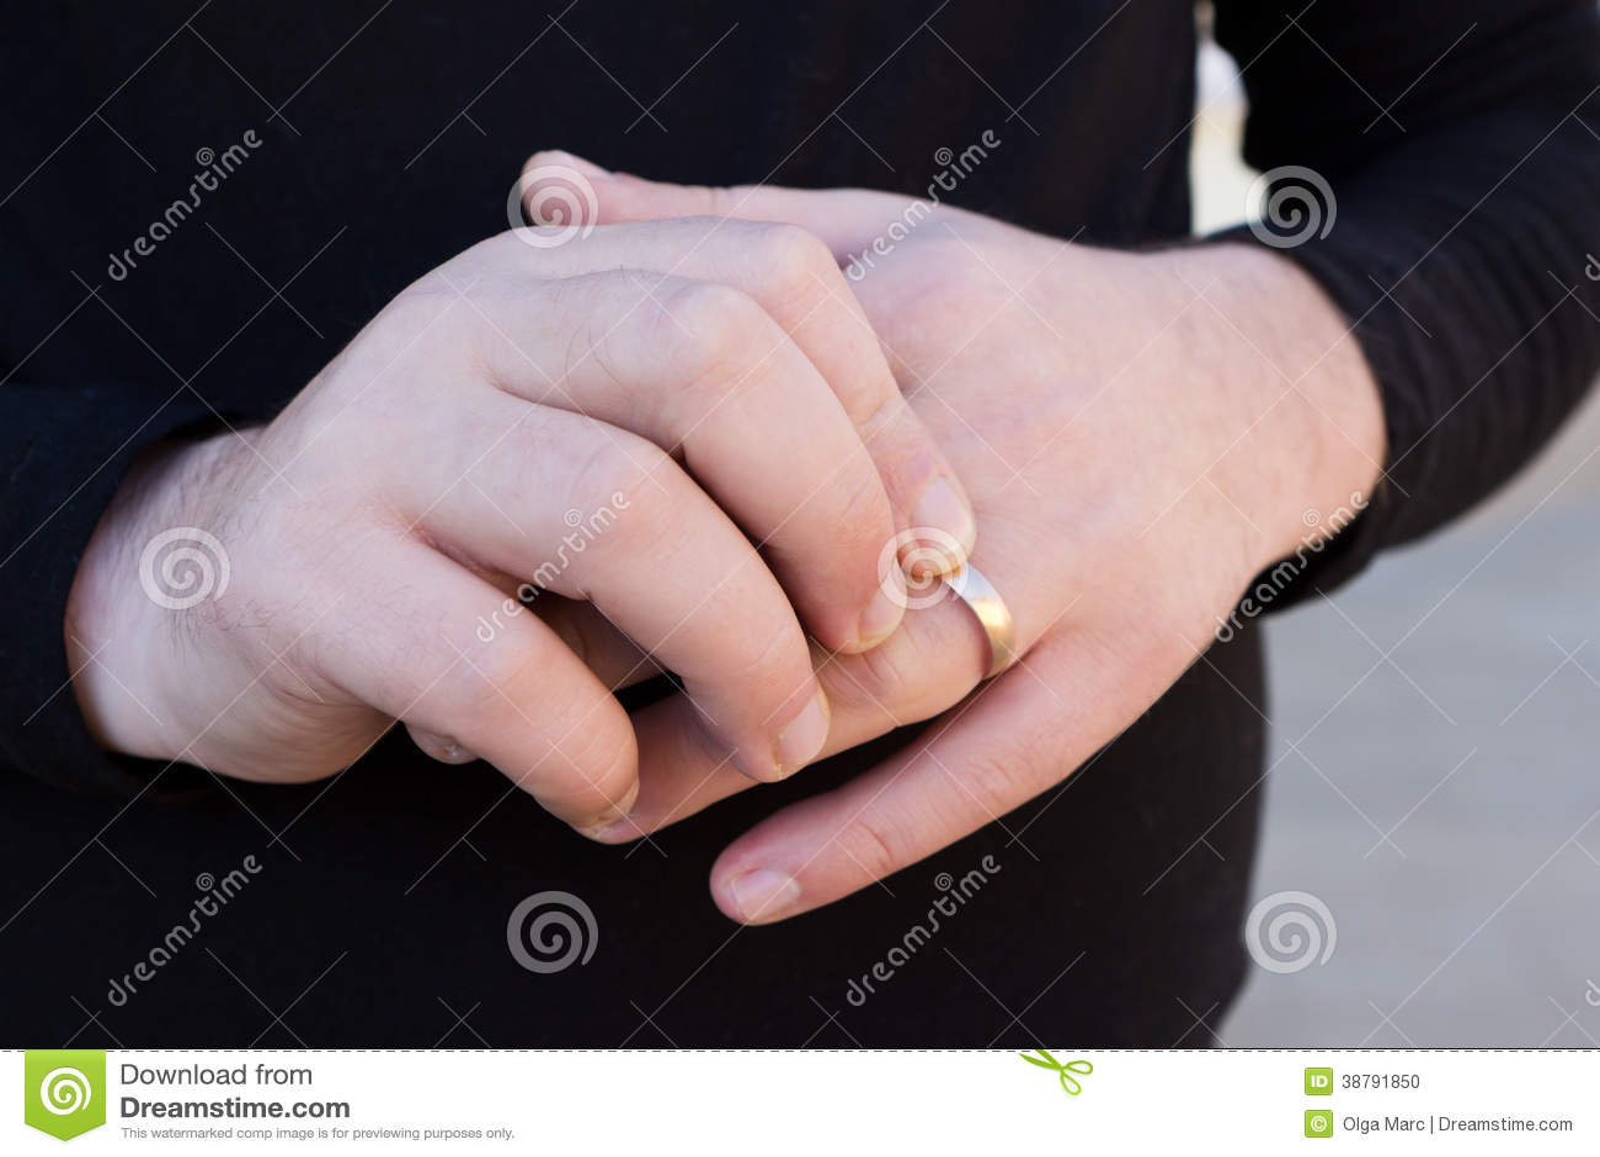 Man Hands With Wedding Ring Stock Photo - Image of wedding, closeup ...